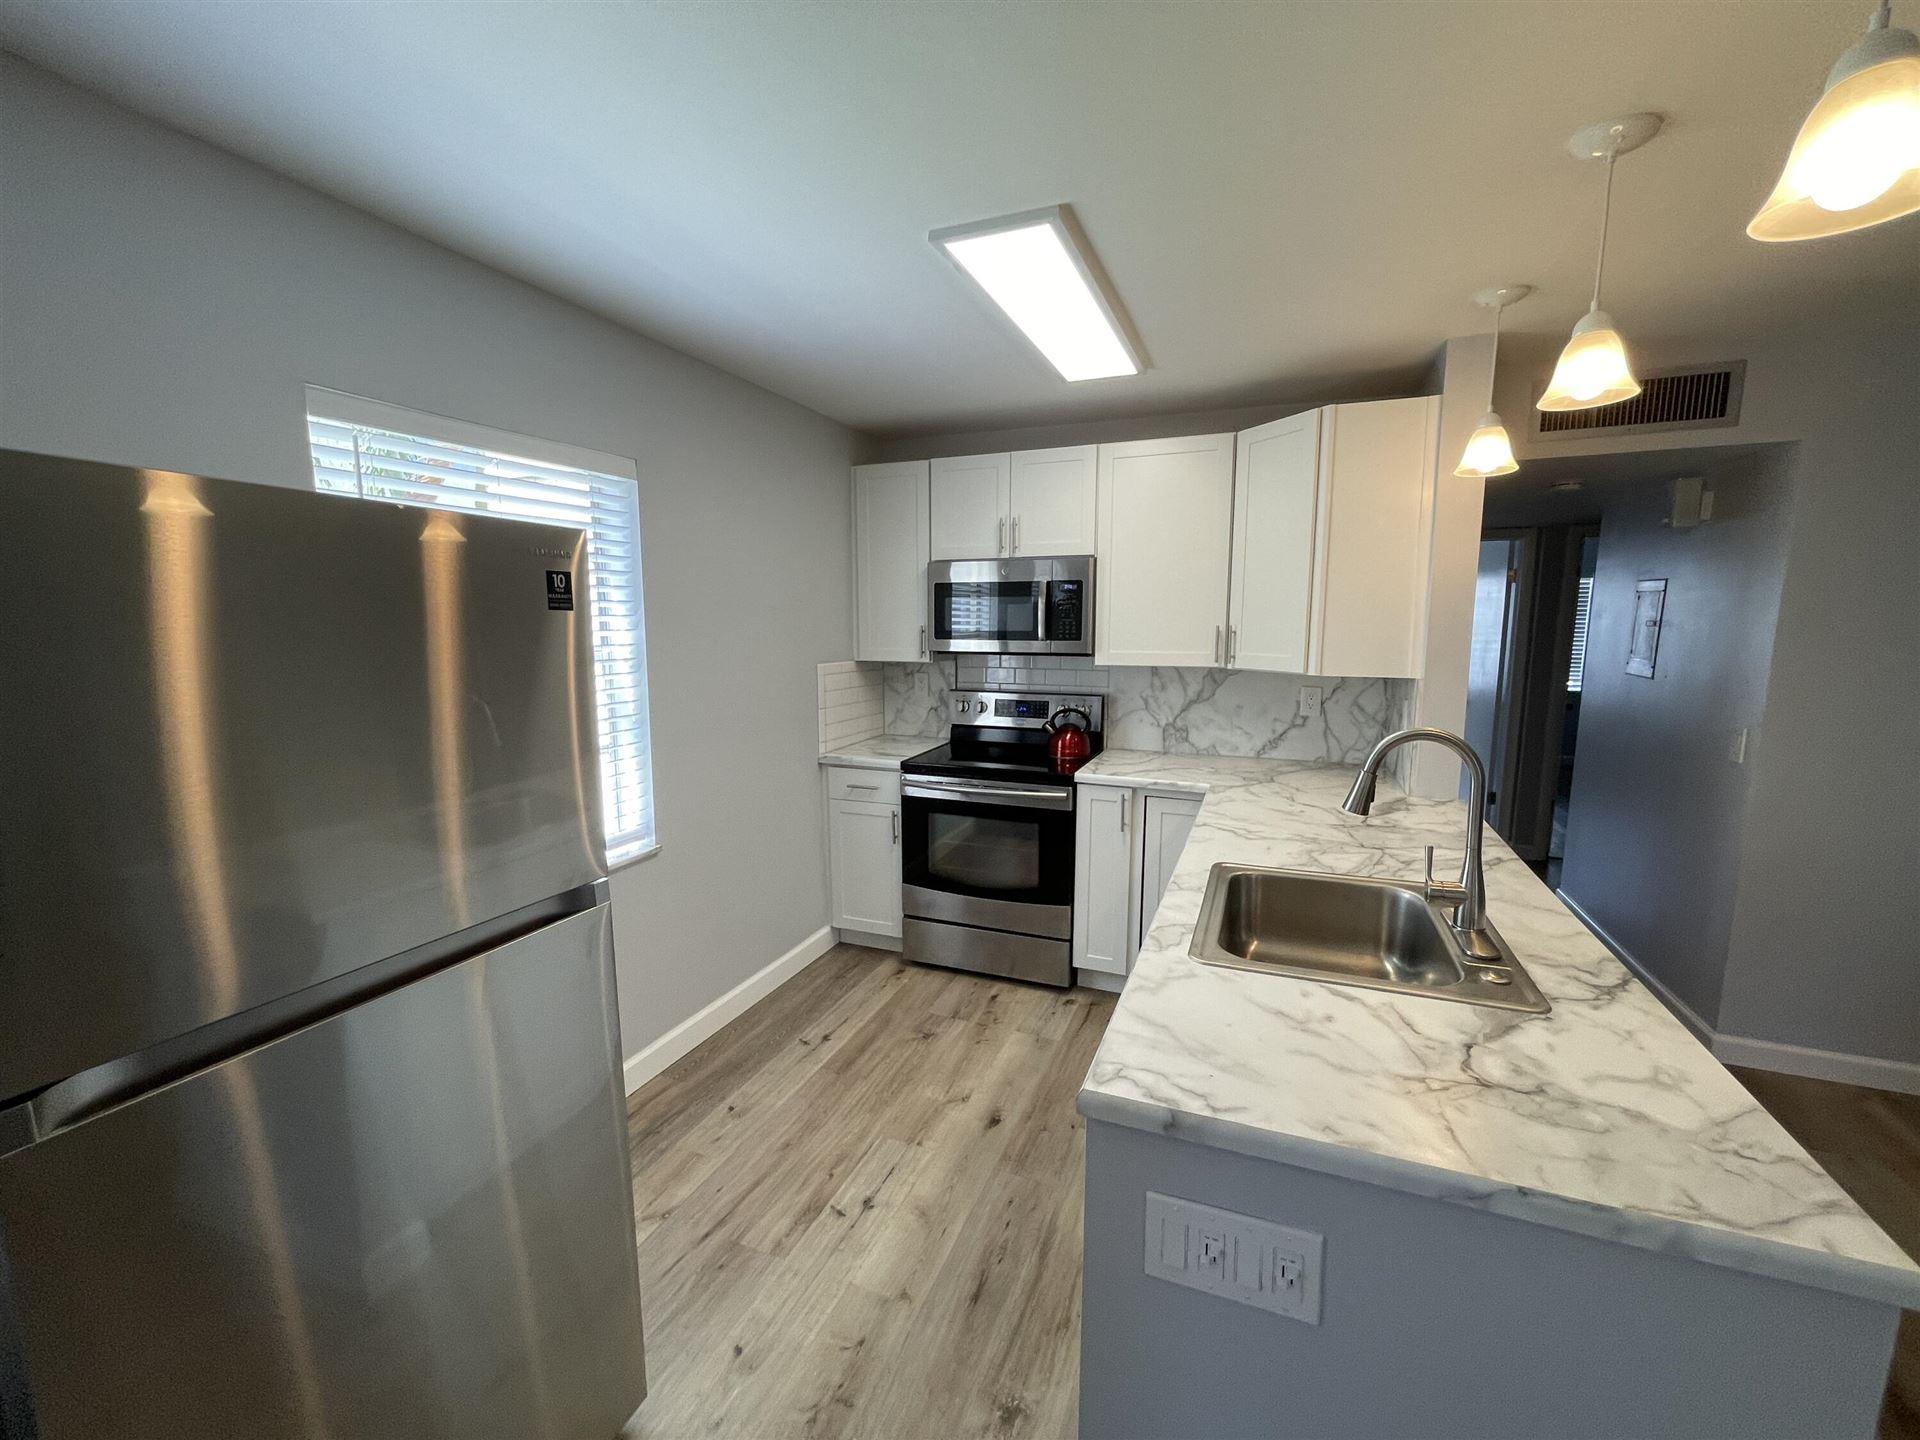 685 Flanders O, Delray Beach, FL 33484 - MLS#: RX-10744740